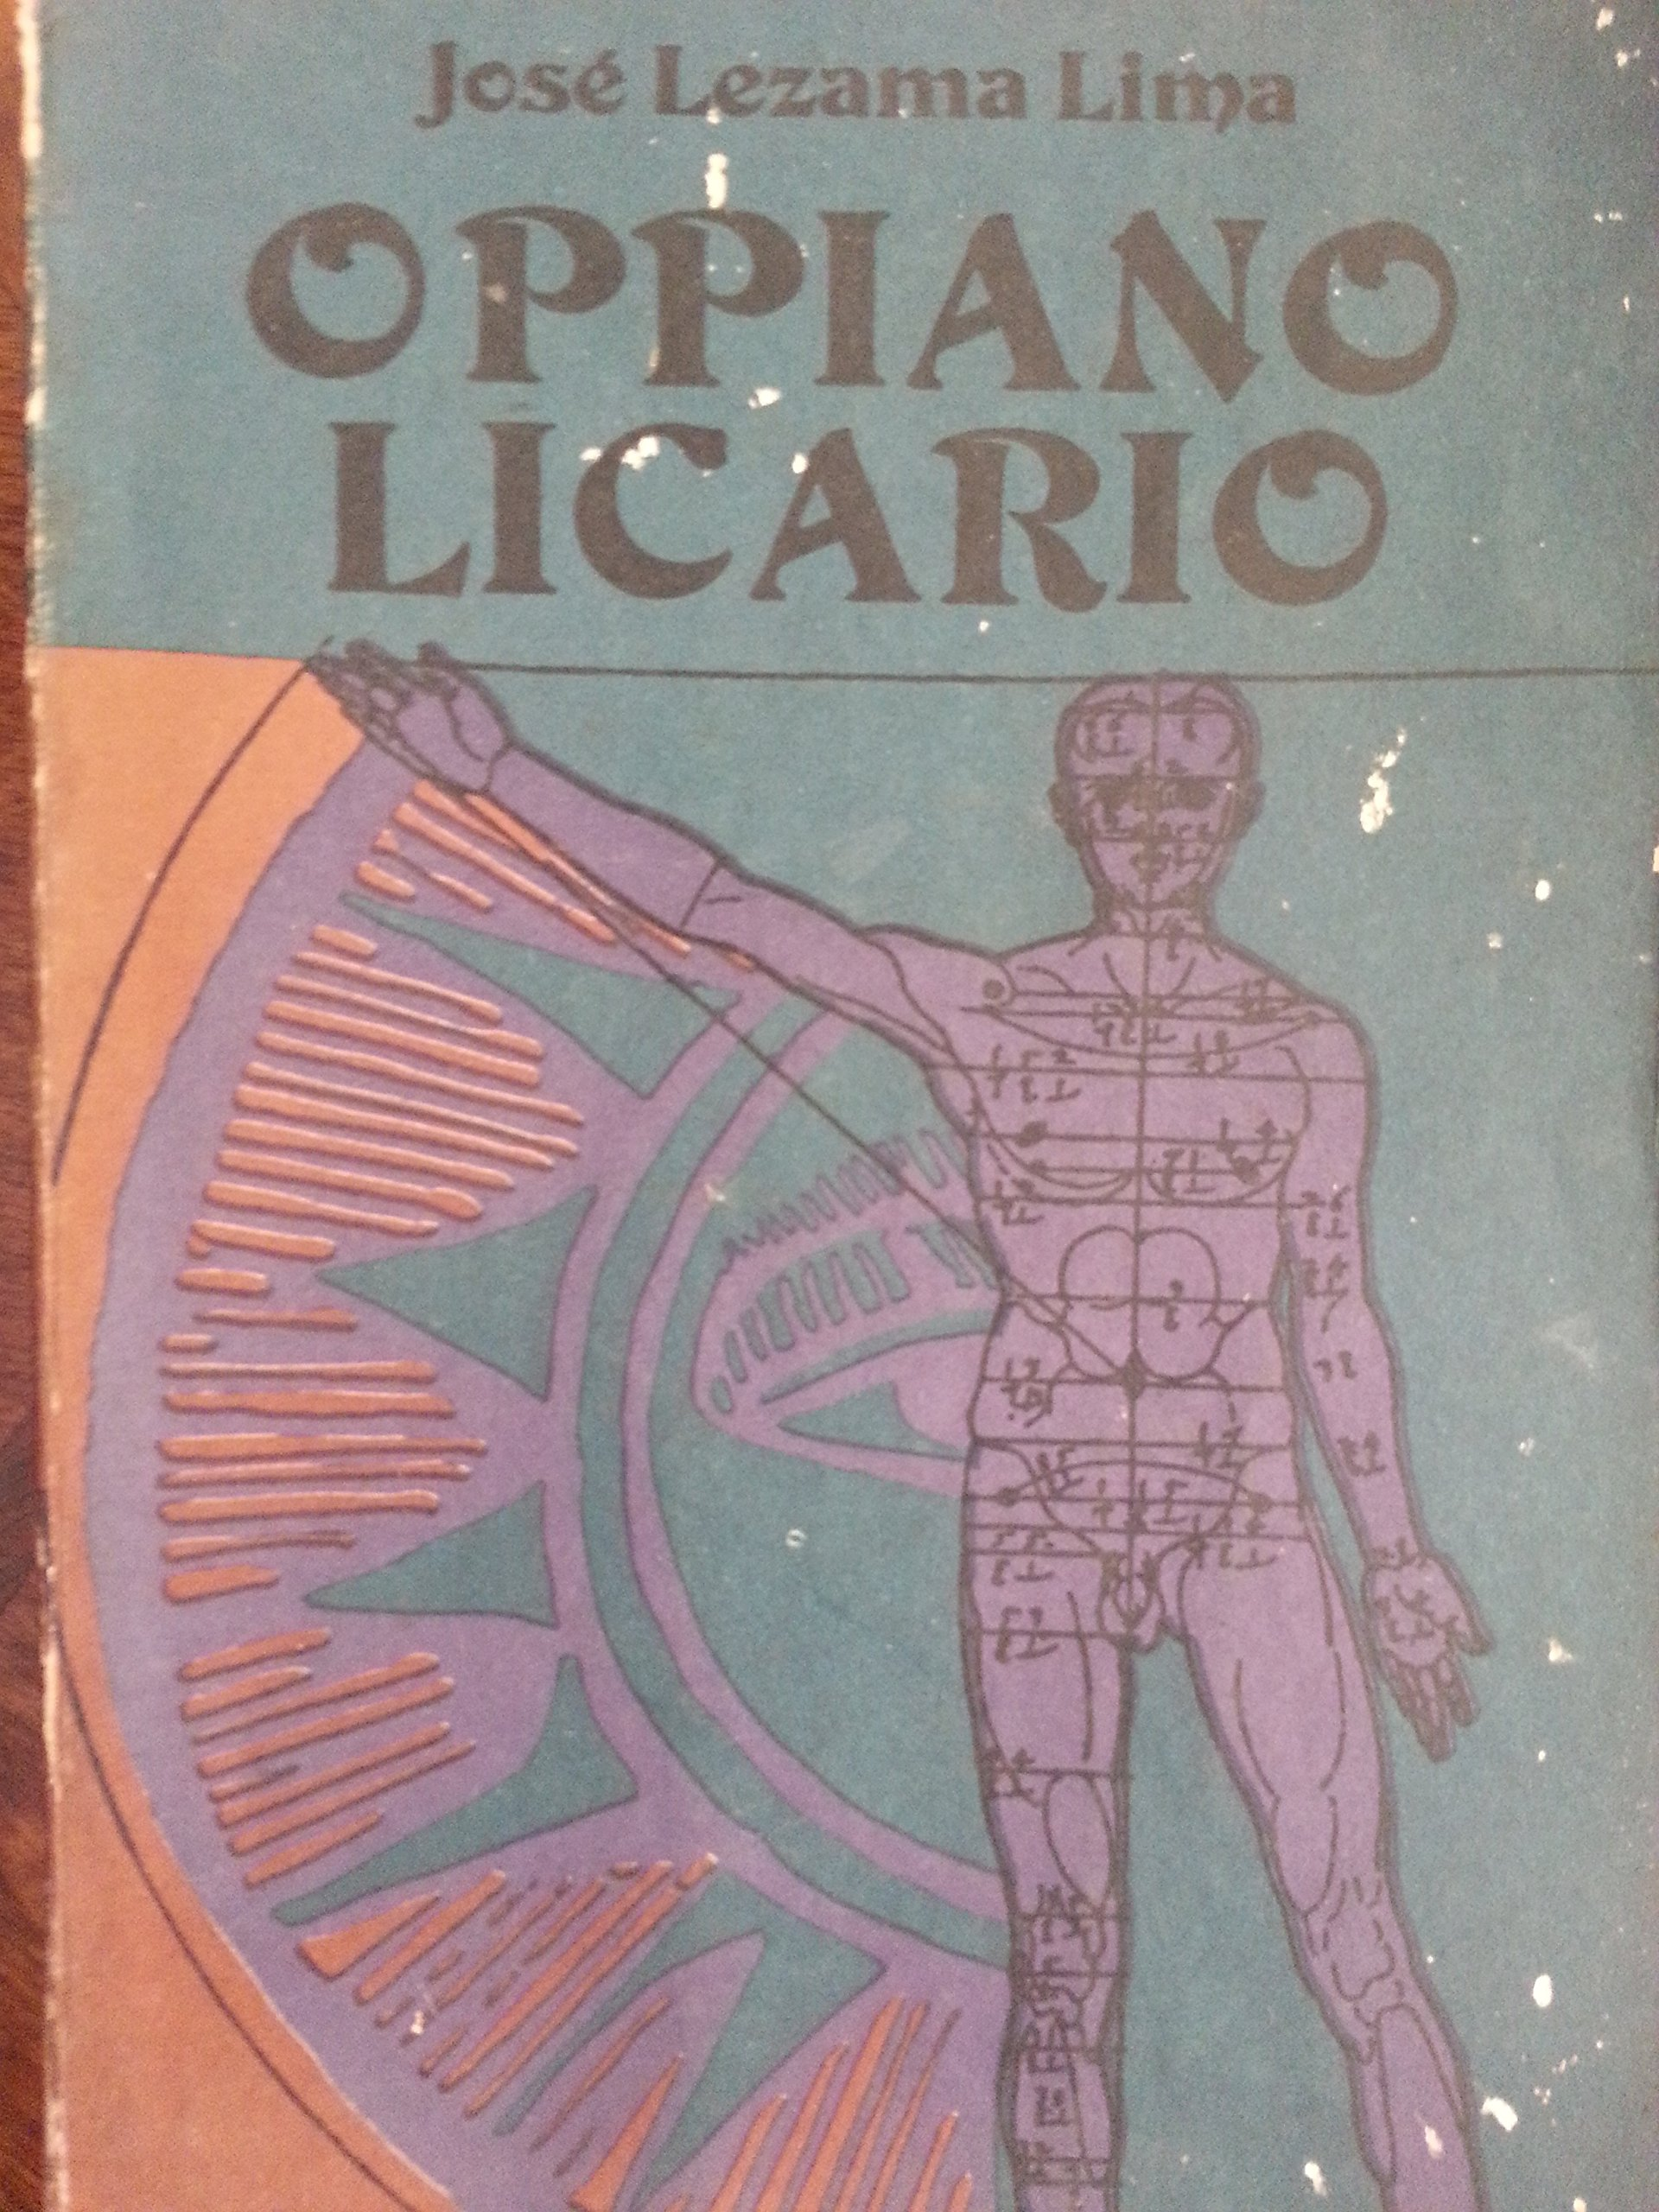 Qppiano licario, novela, primera edicion, 1977.: jose lezama lima, manuel moreno fraginals: Amazon.com: Books